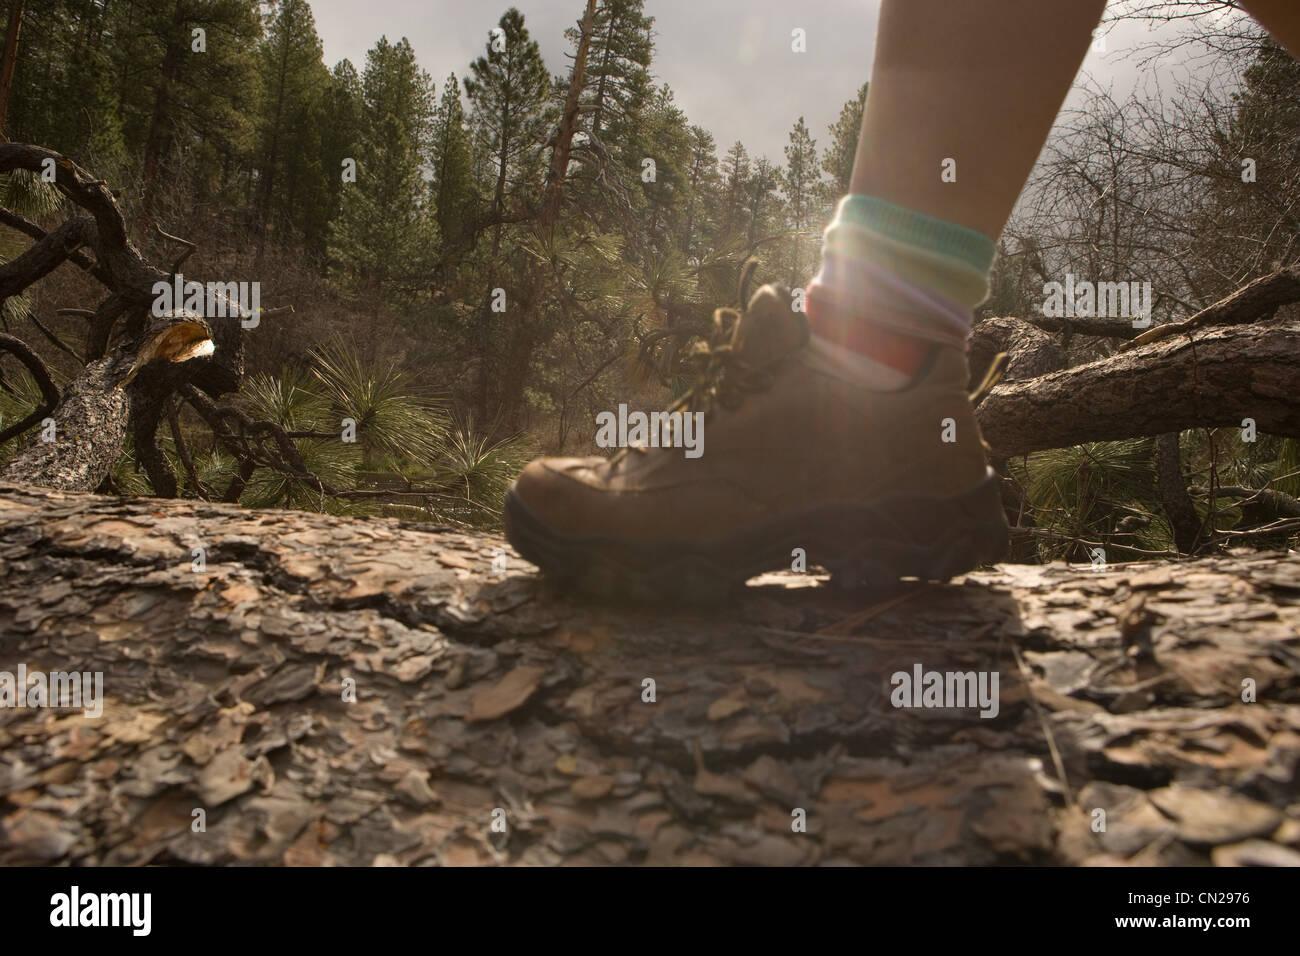 Frau Wandern entlang Baumstamm Stockbild